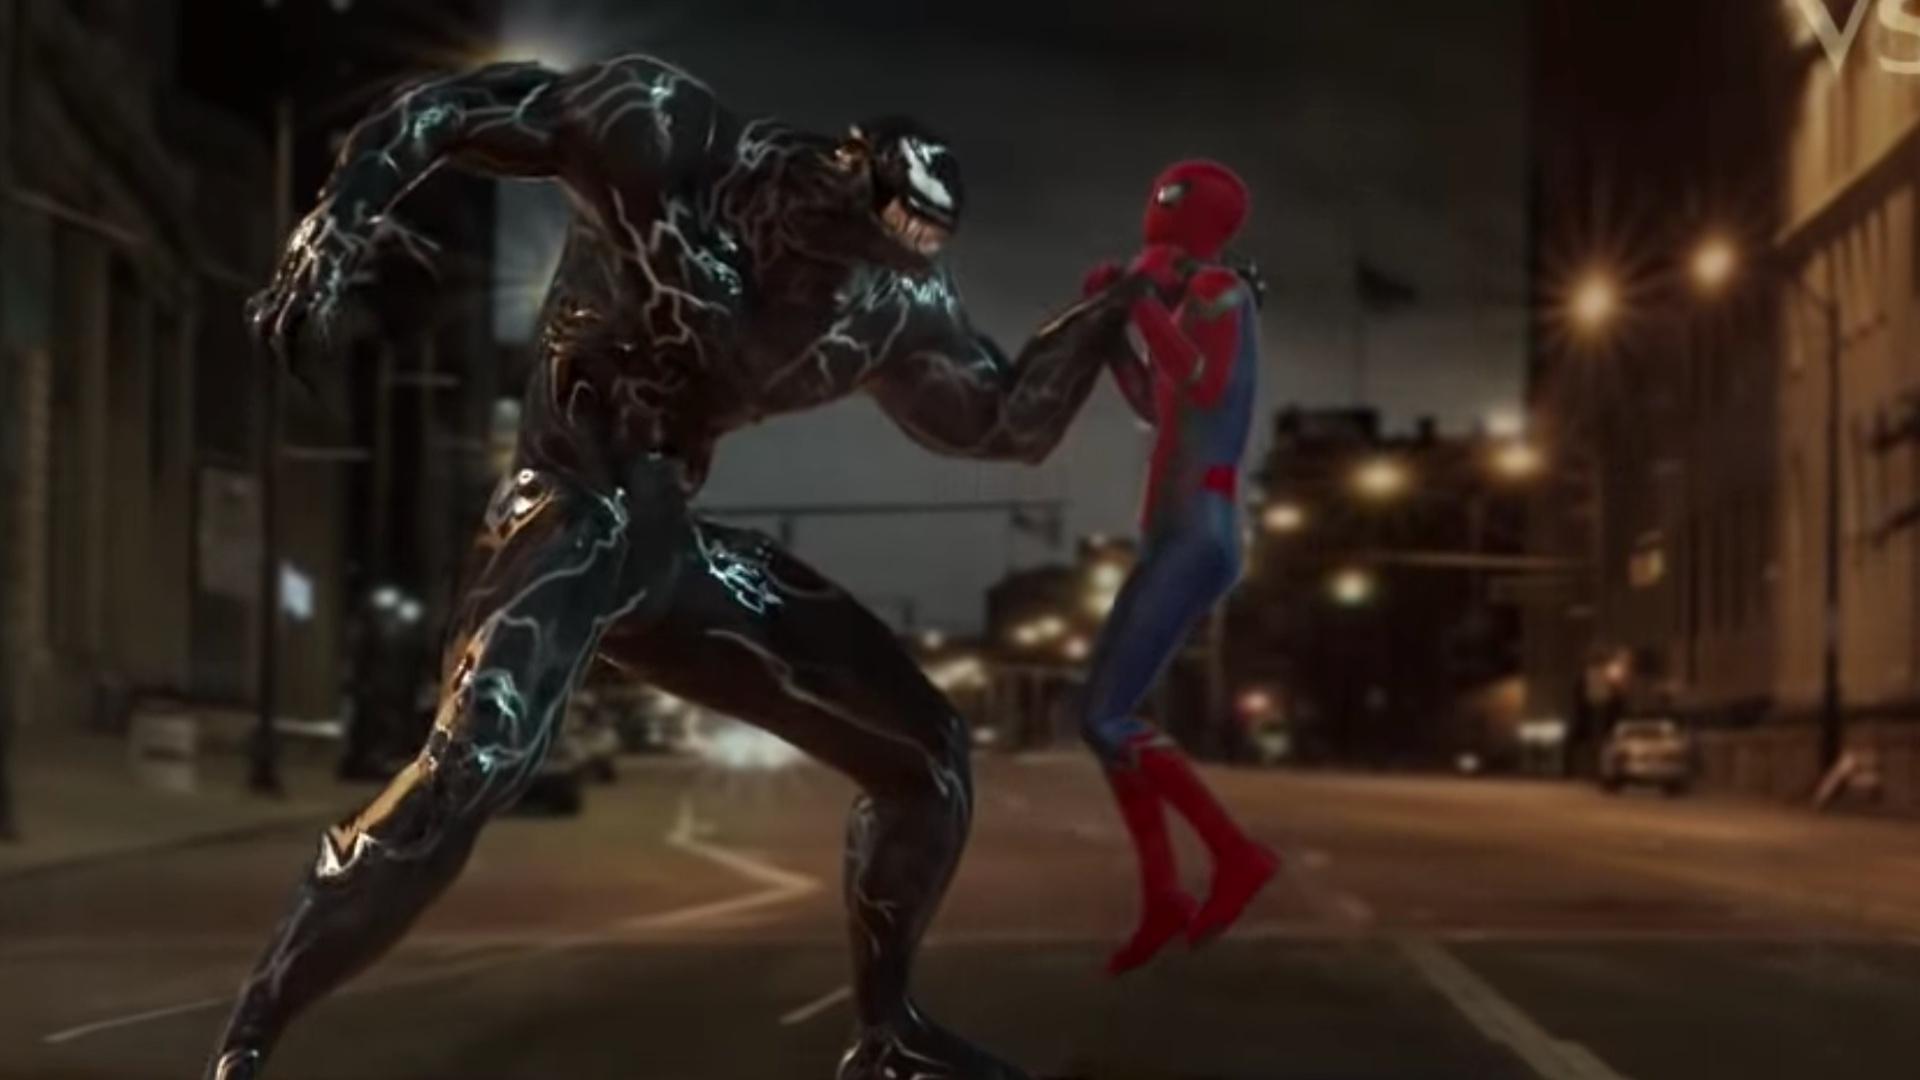 impressive fan-made cgi marvel video pits tom hardy's venom against